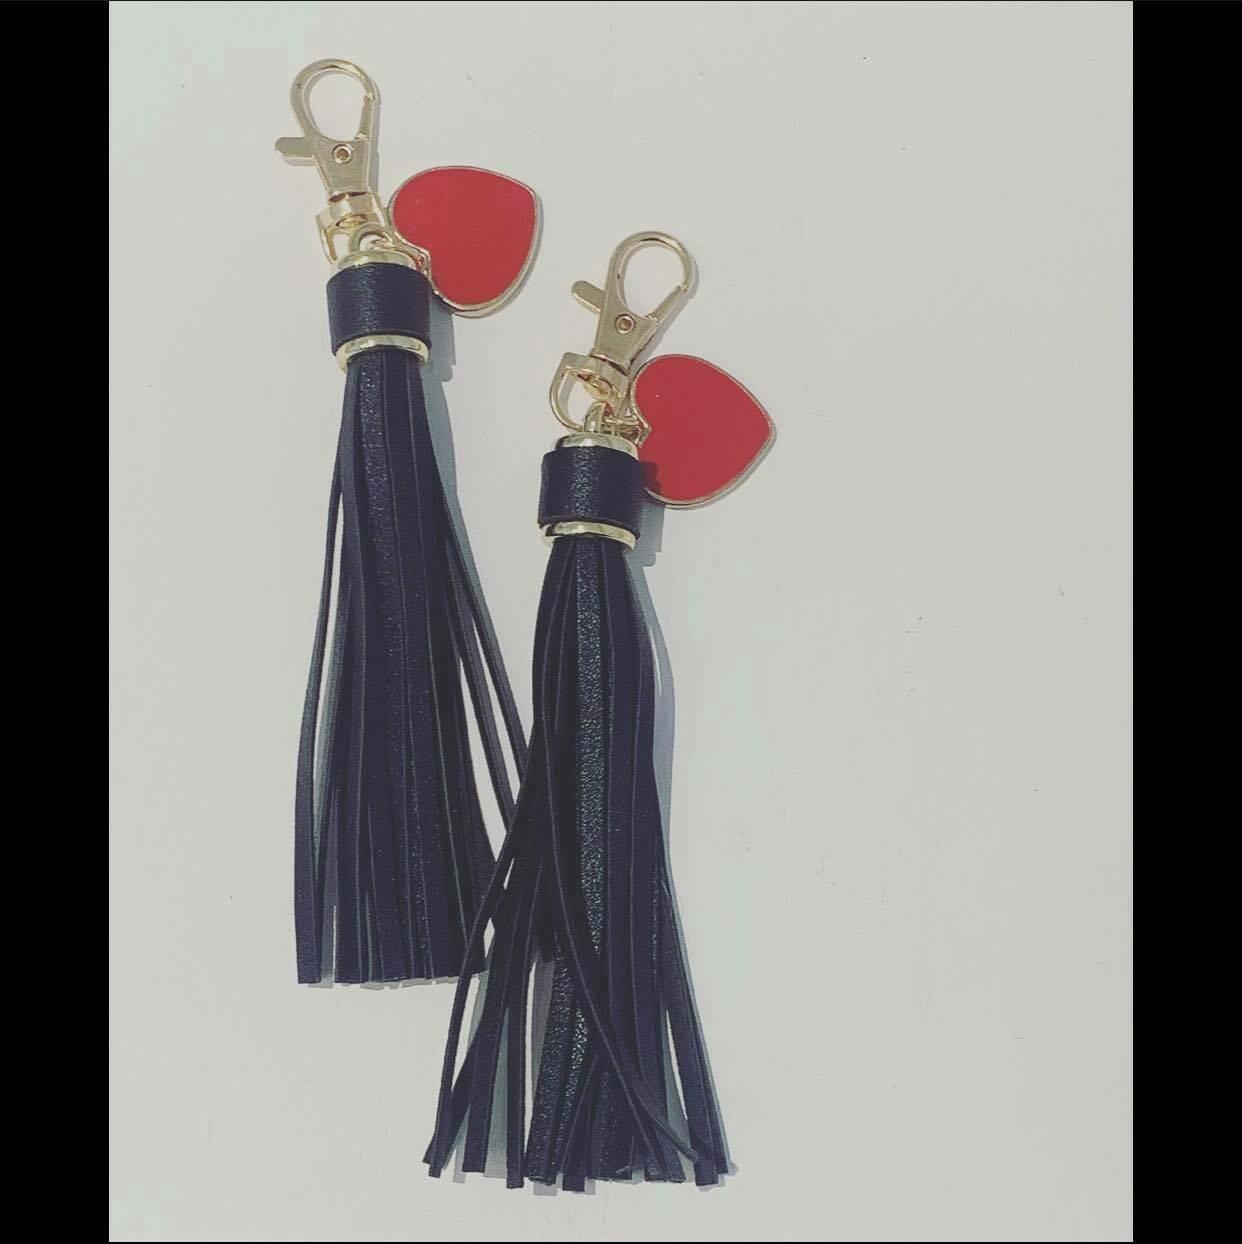 Tassel heart Key Chain